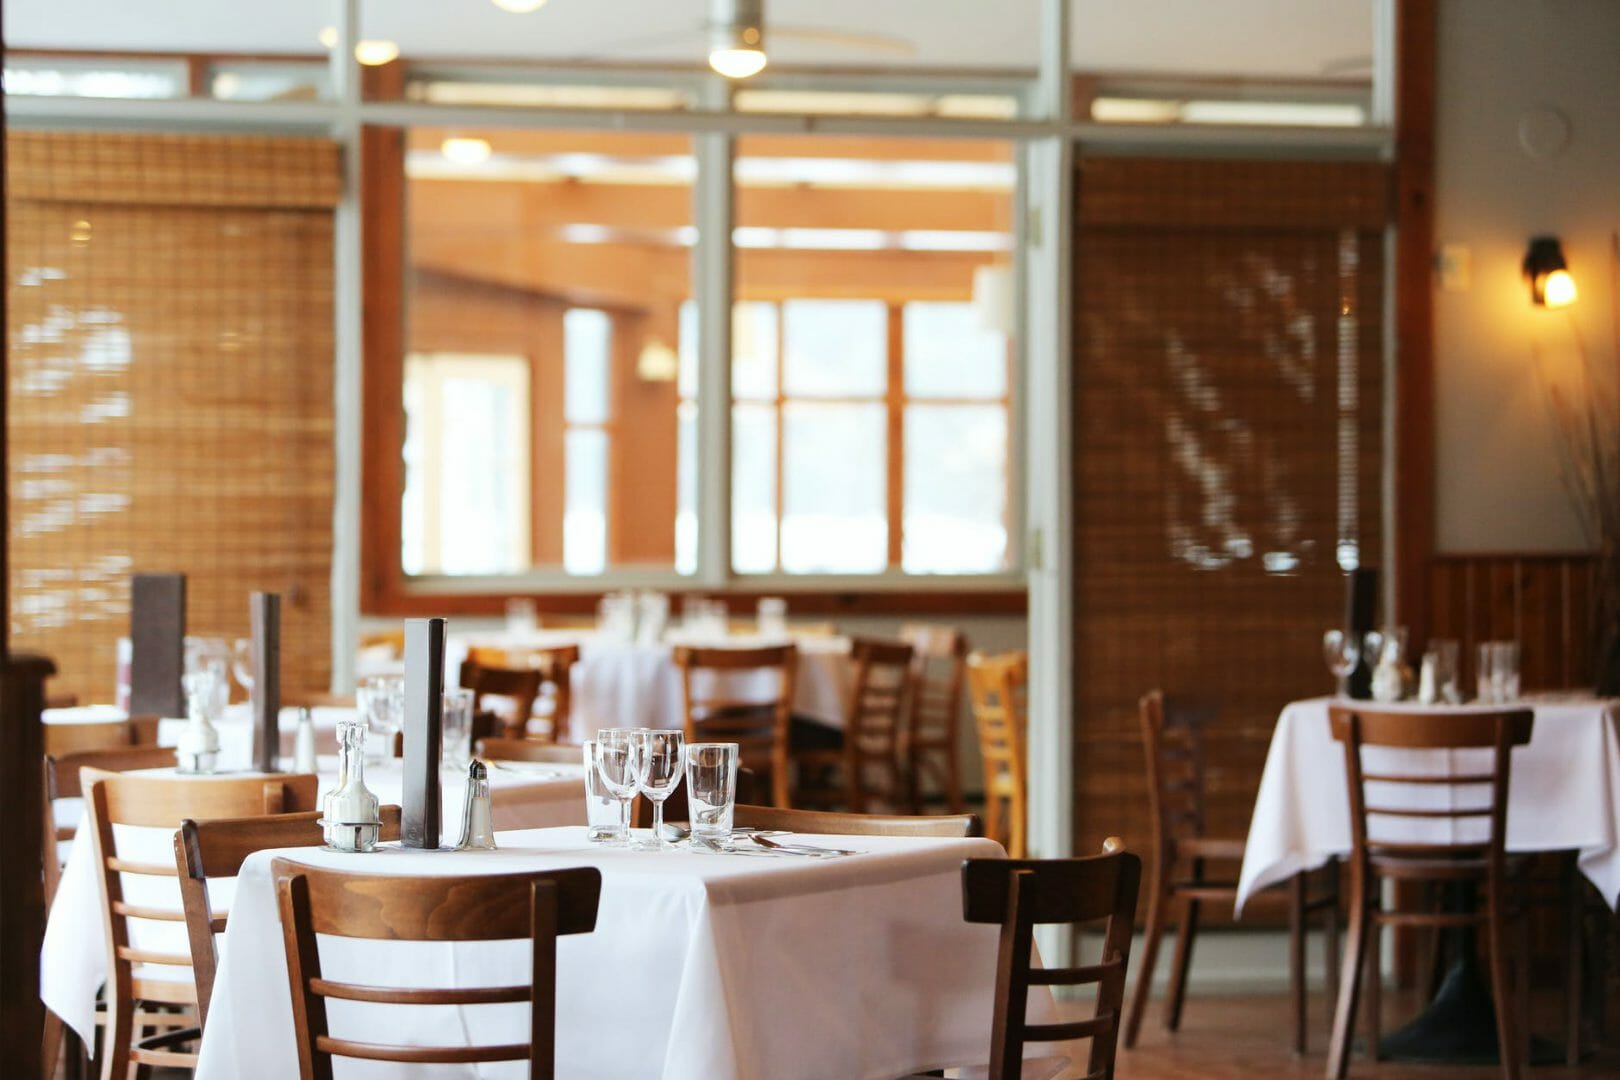 installing ebt cameras in your restaurant